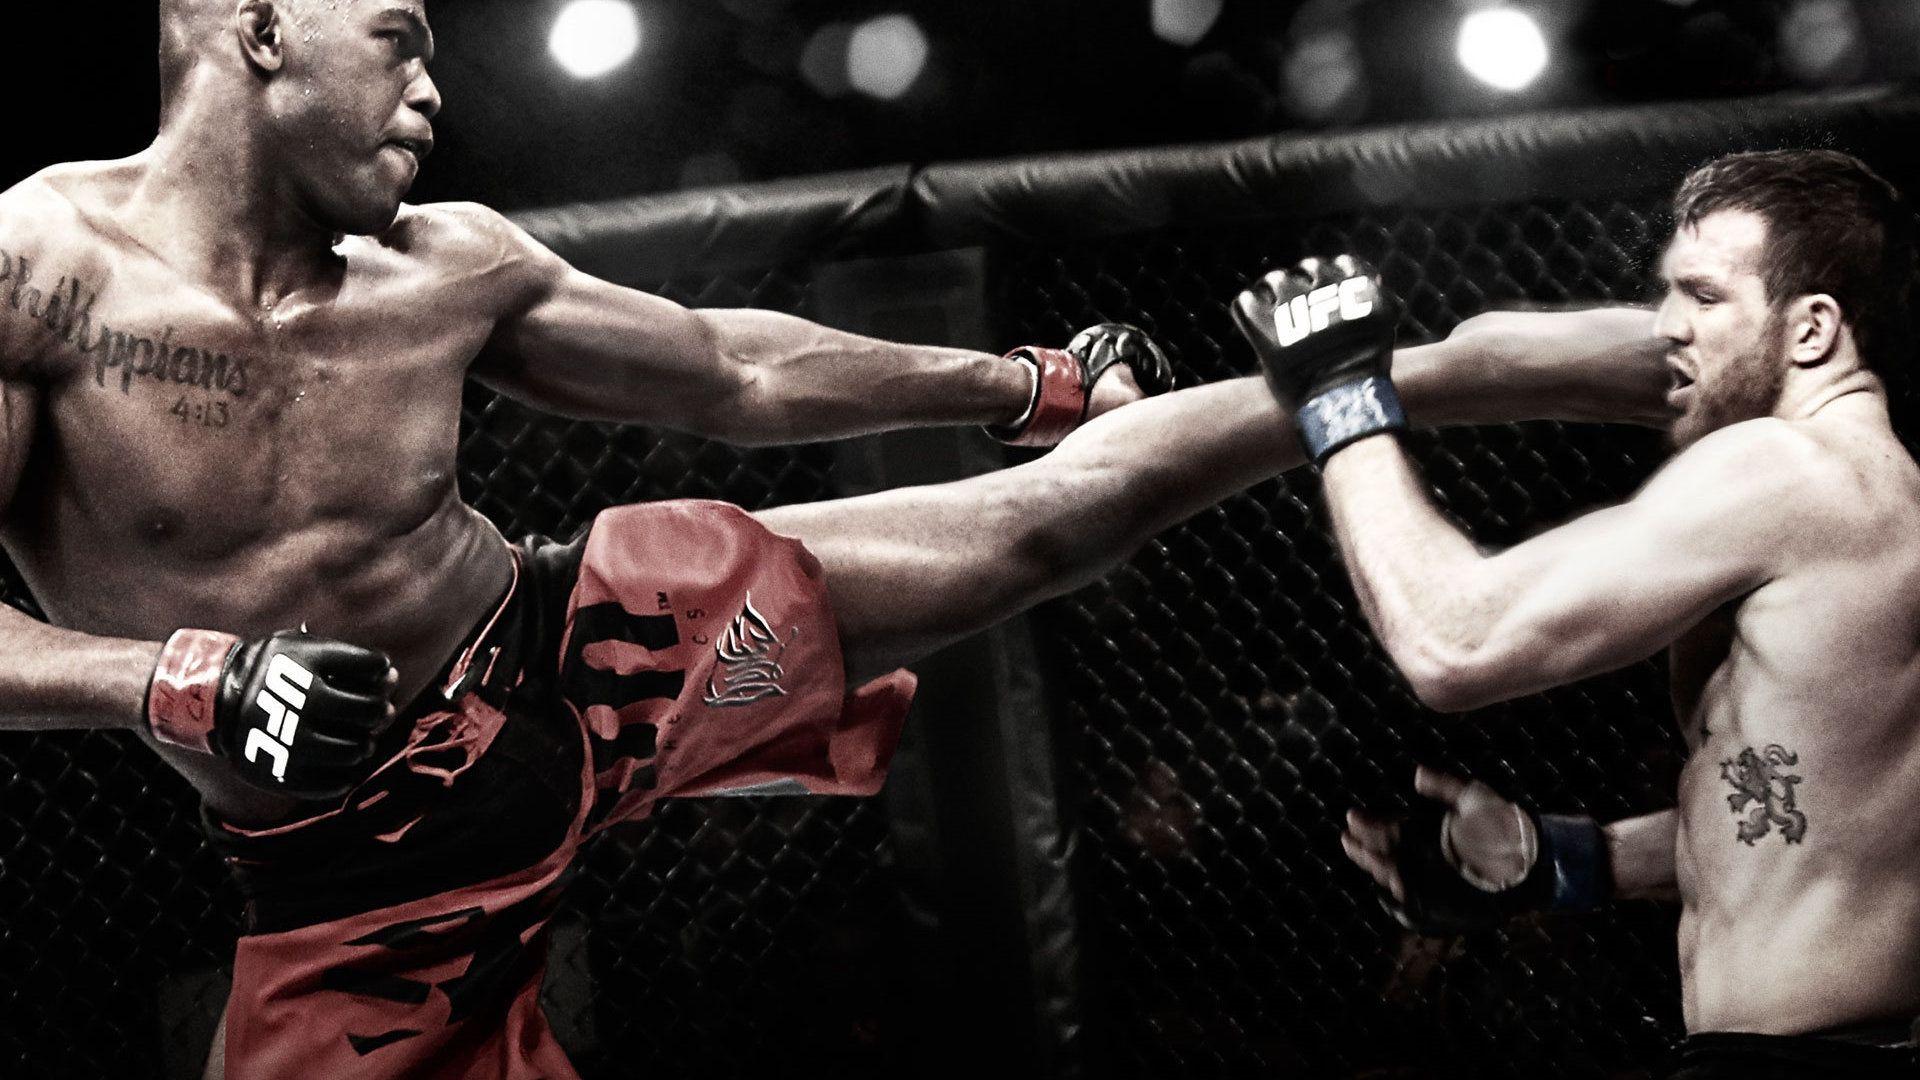 Anderson Silva Ultimate Fight Championship Ufc Ufc Jon Jones Mixed Martial Arts